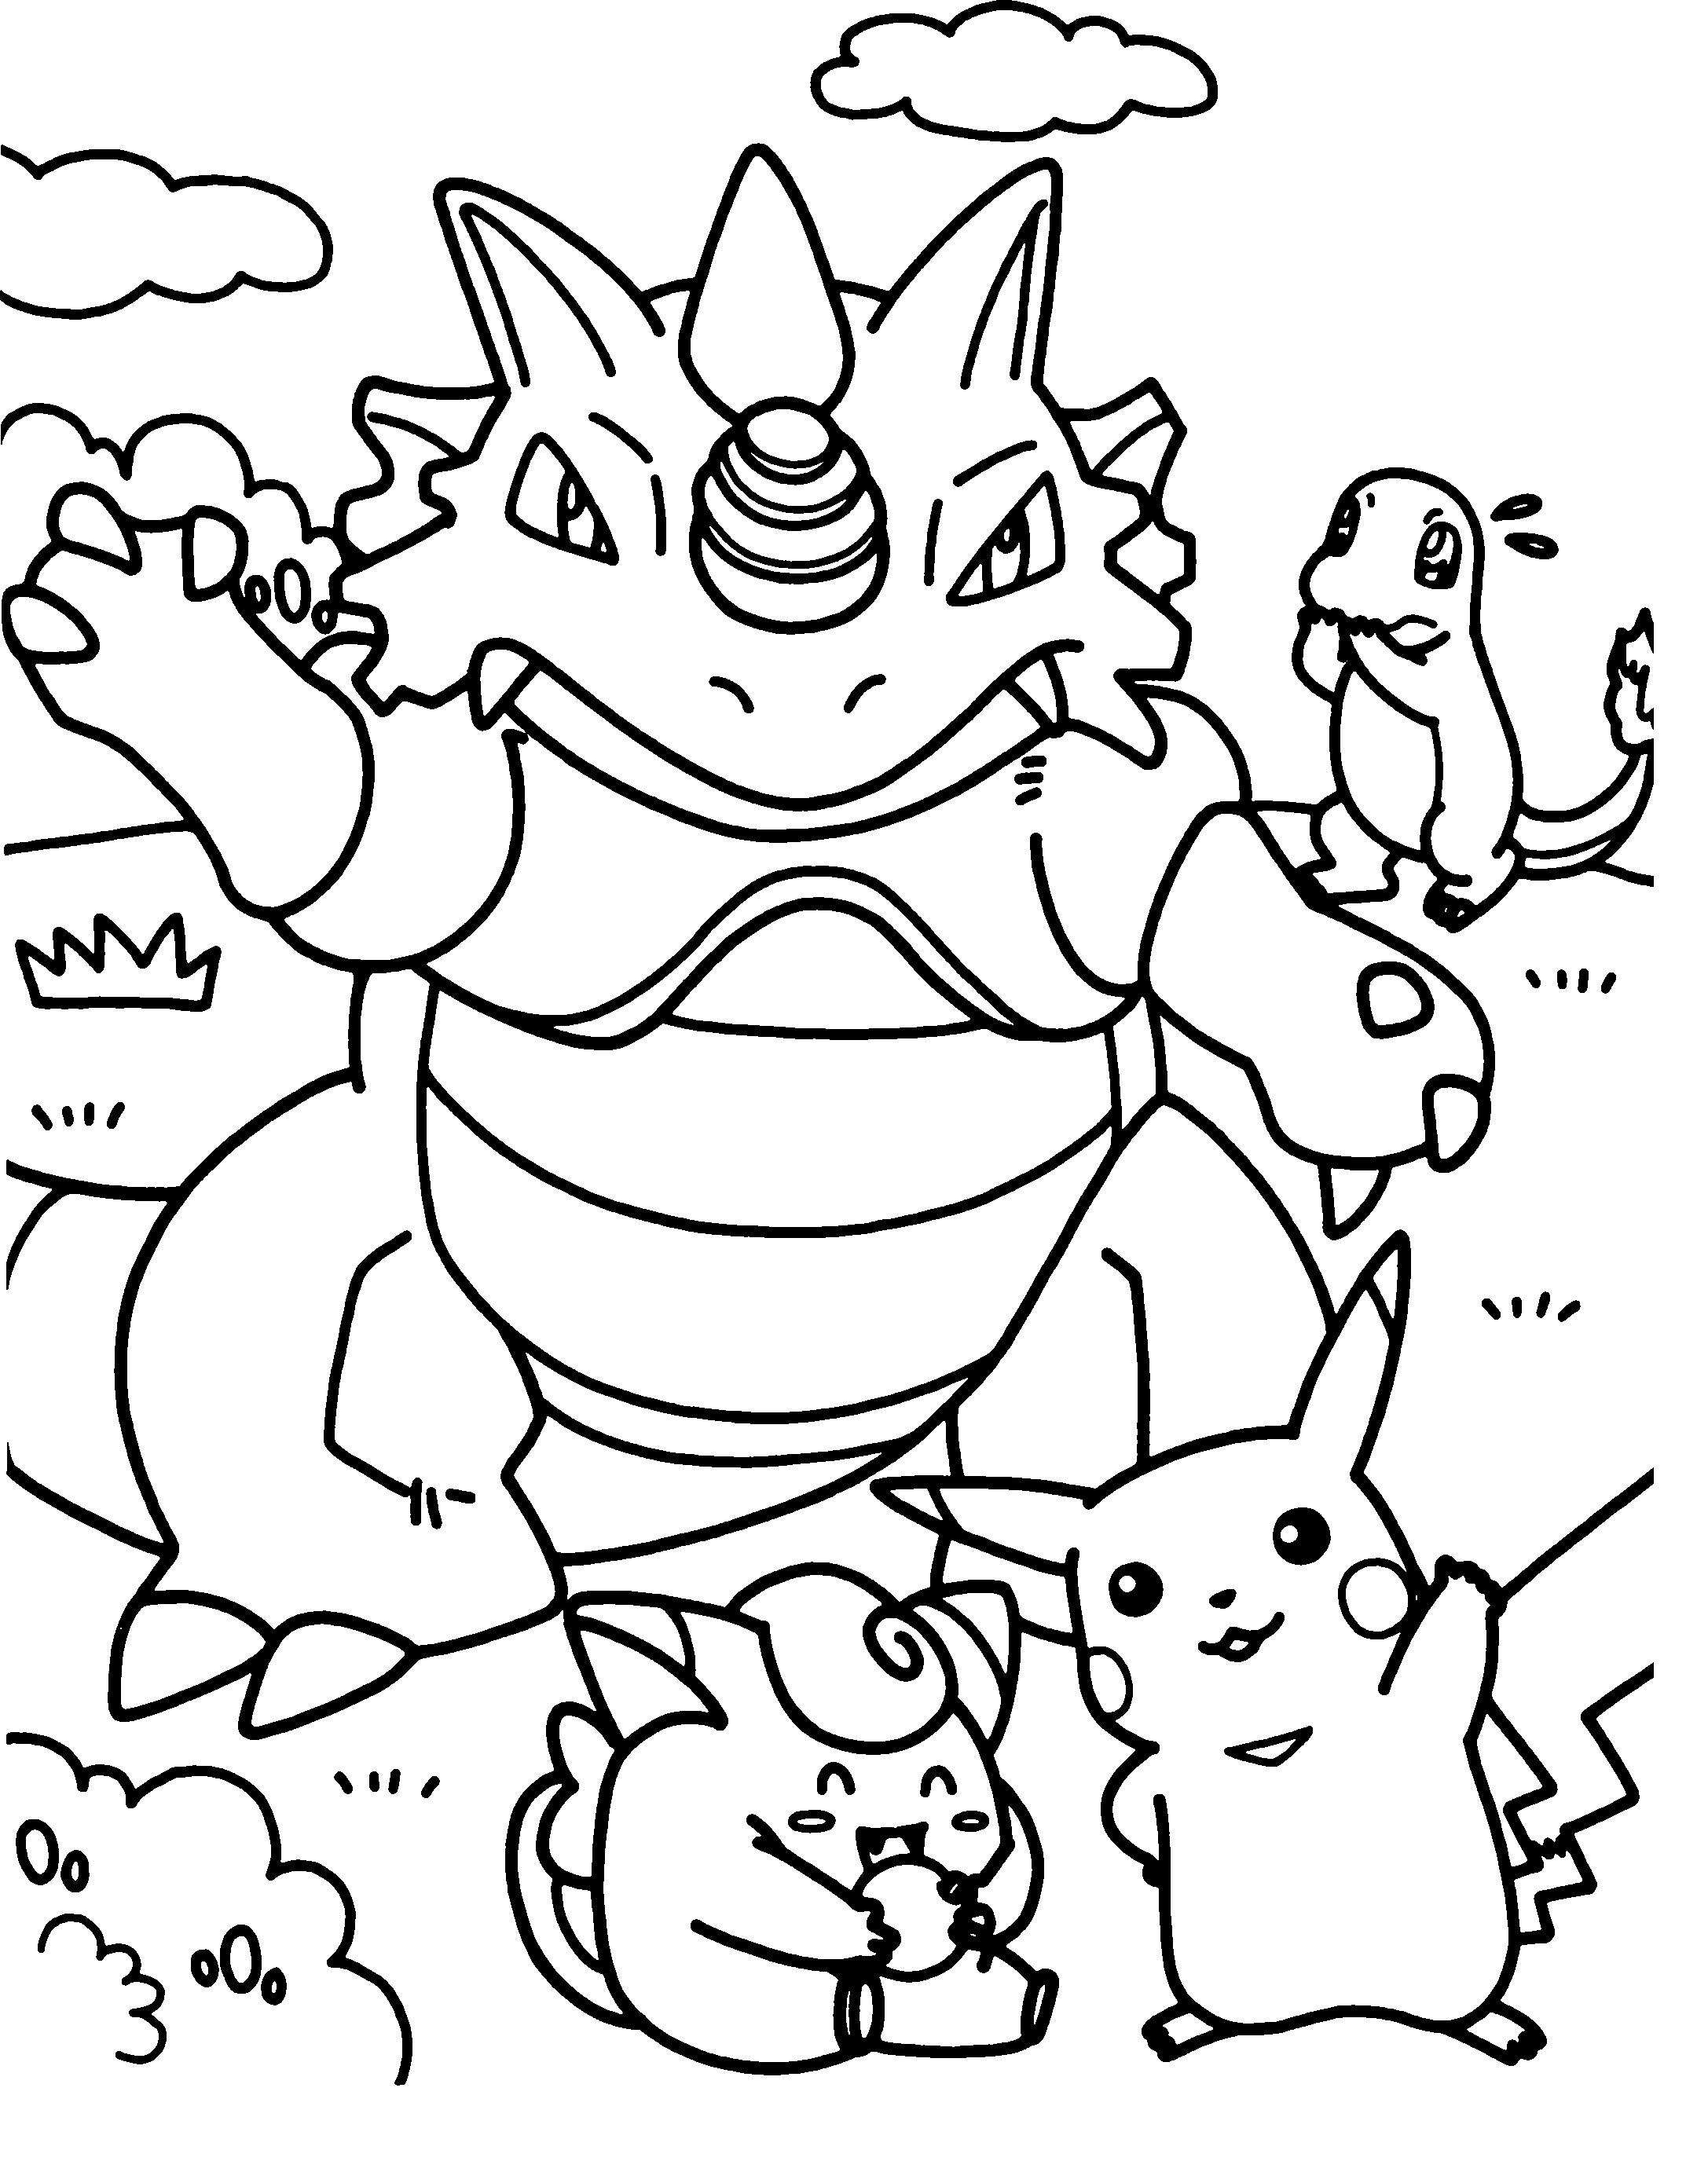 printable pokemon coloring sheets top 93 free printable pokemon coloring pages online sheets printable coloring pokemon